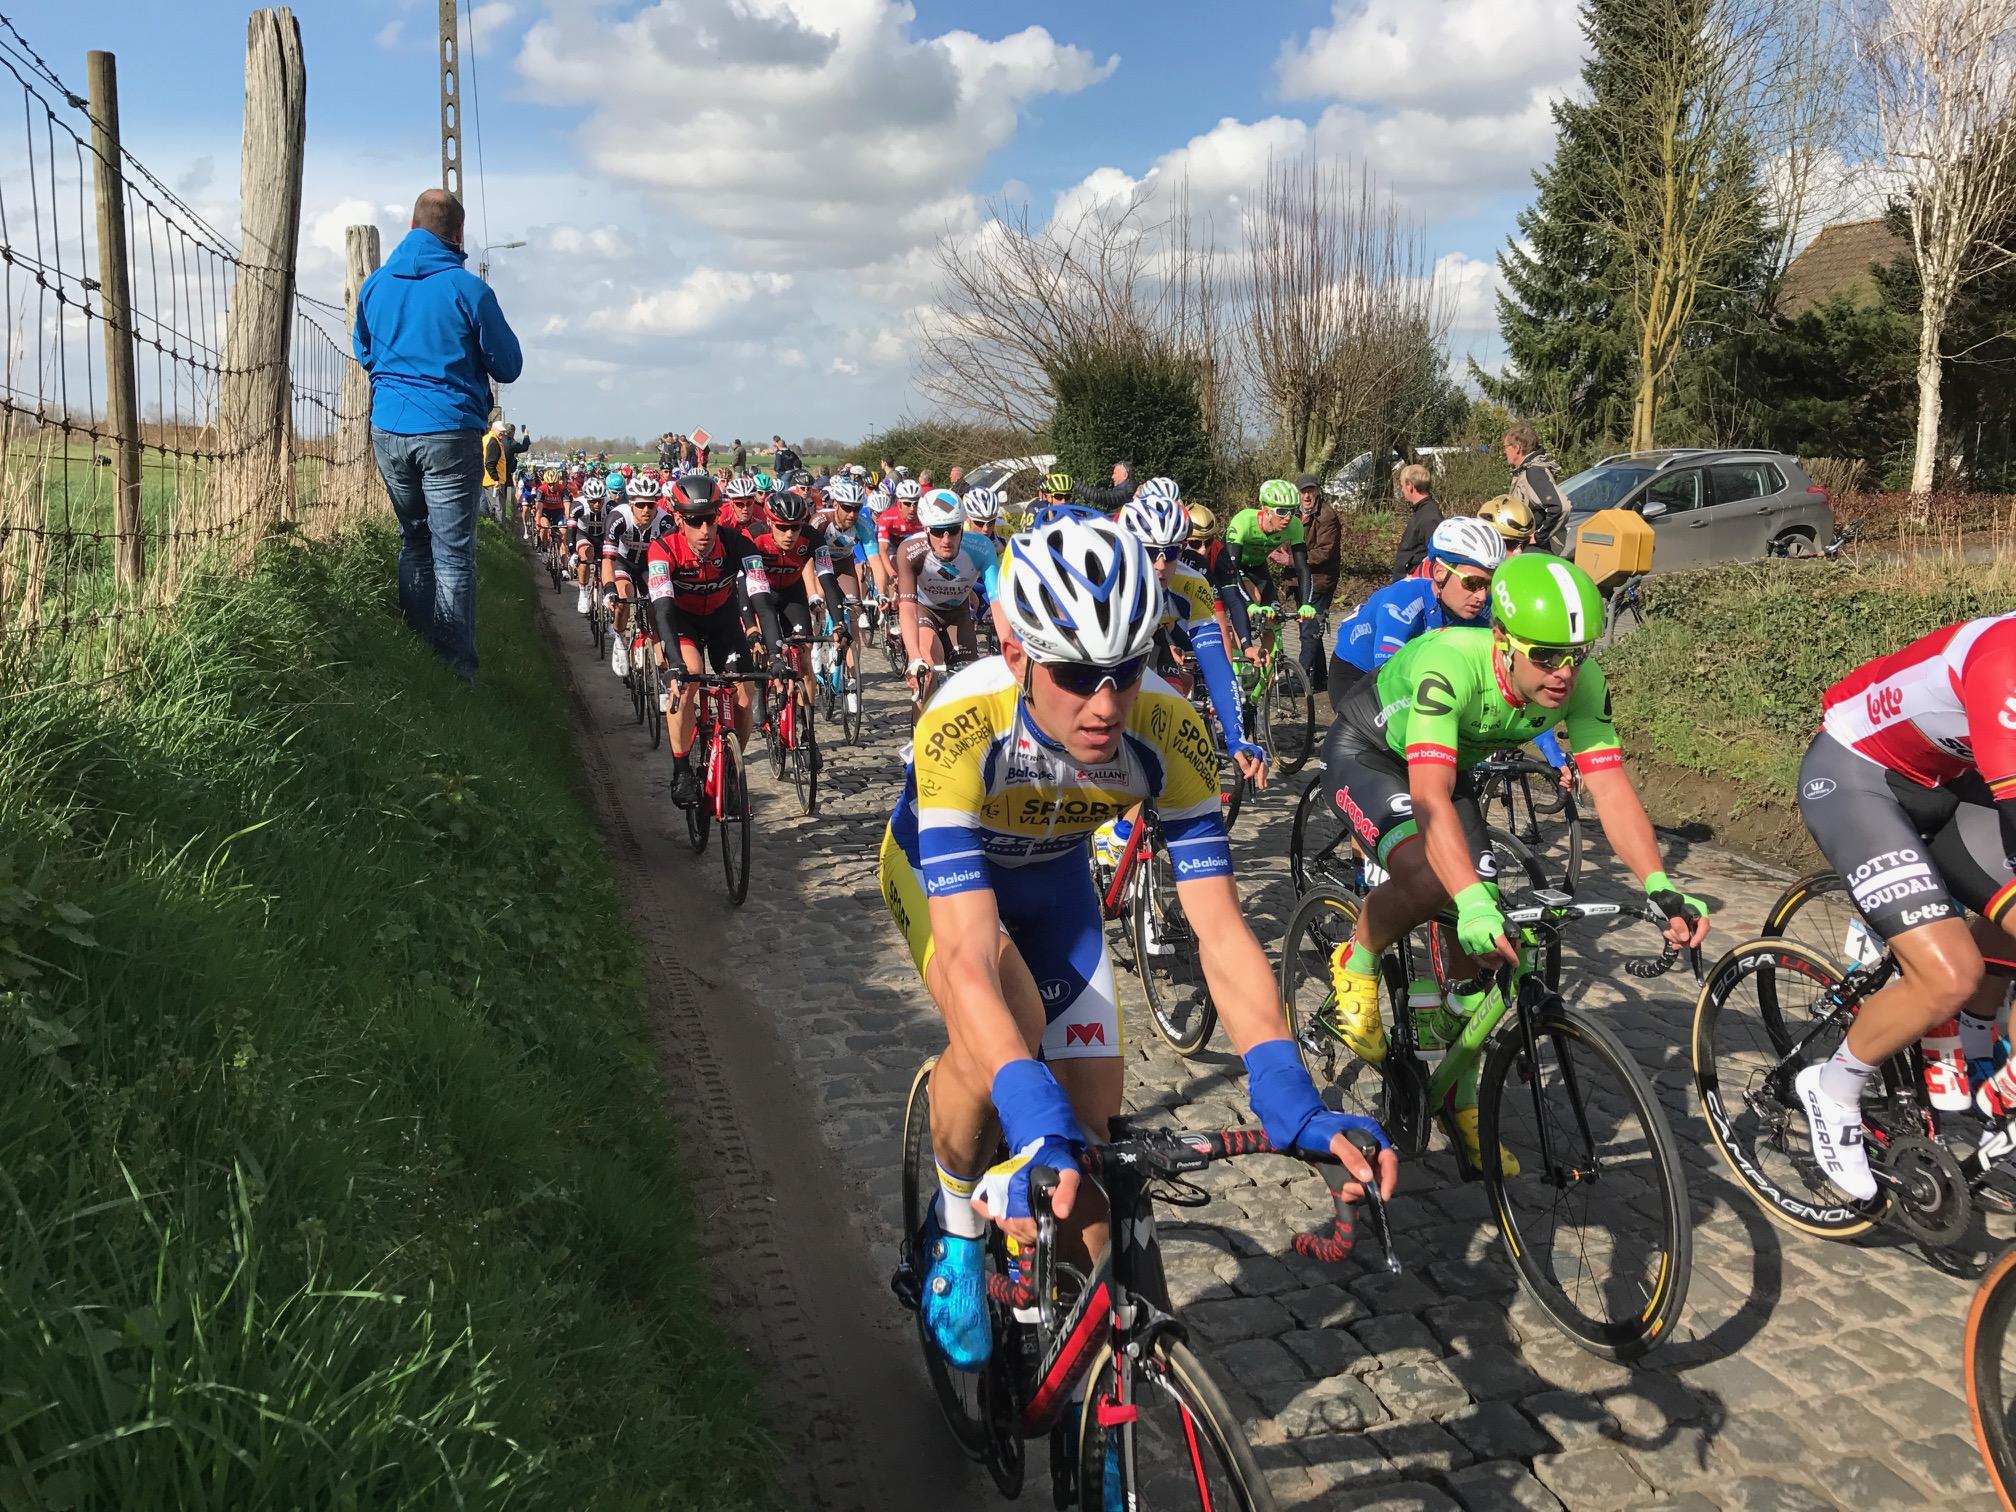 Dwars Vlaanderen 17 - The peloton slams over the Holleweg cobbles just outside Maarke Kerkem